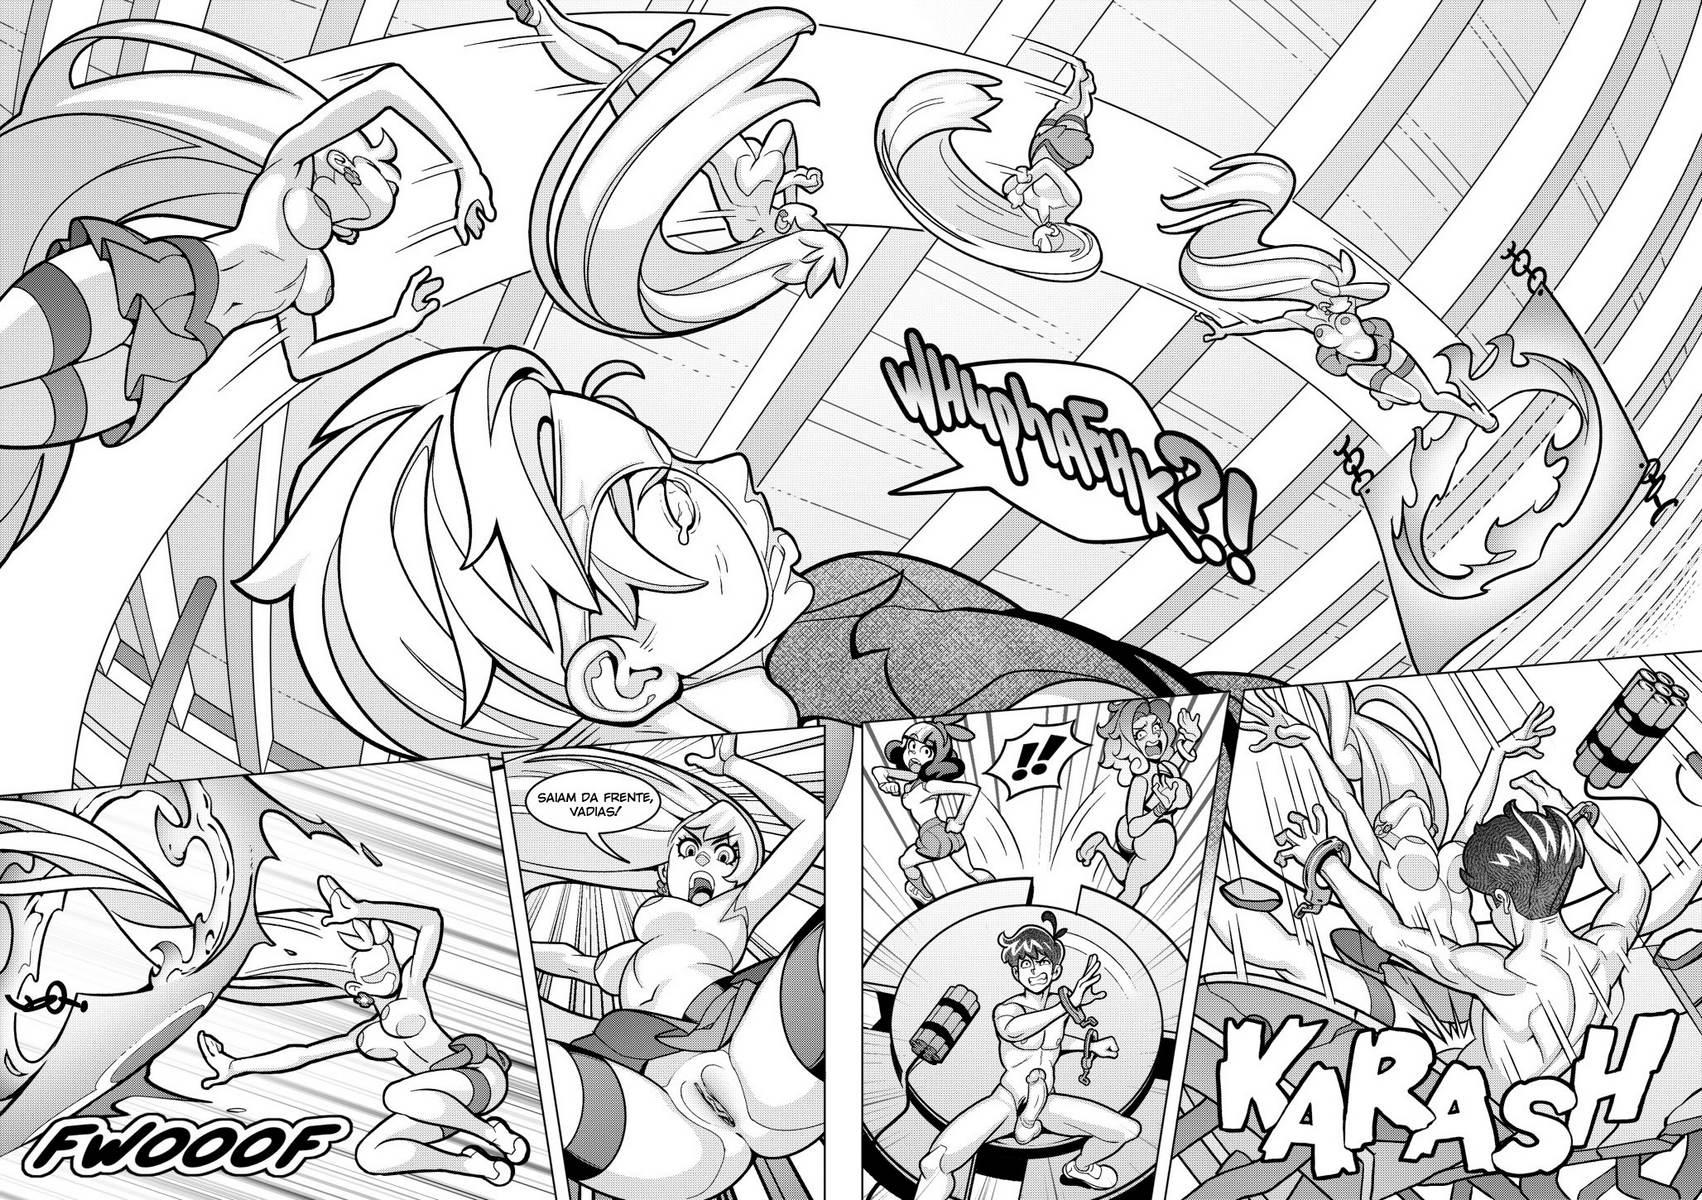 Hot Shit High part 2 Hentai pt br 57 - hentai, exclusiva, comics-hq